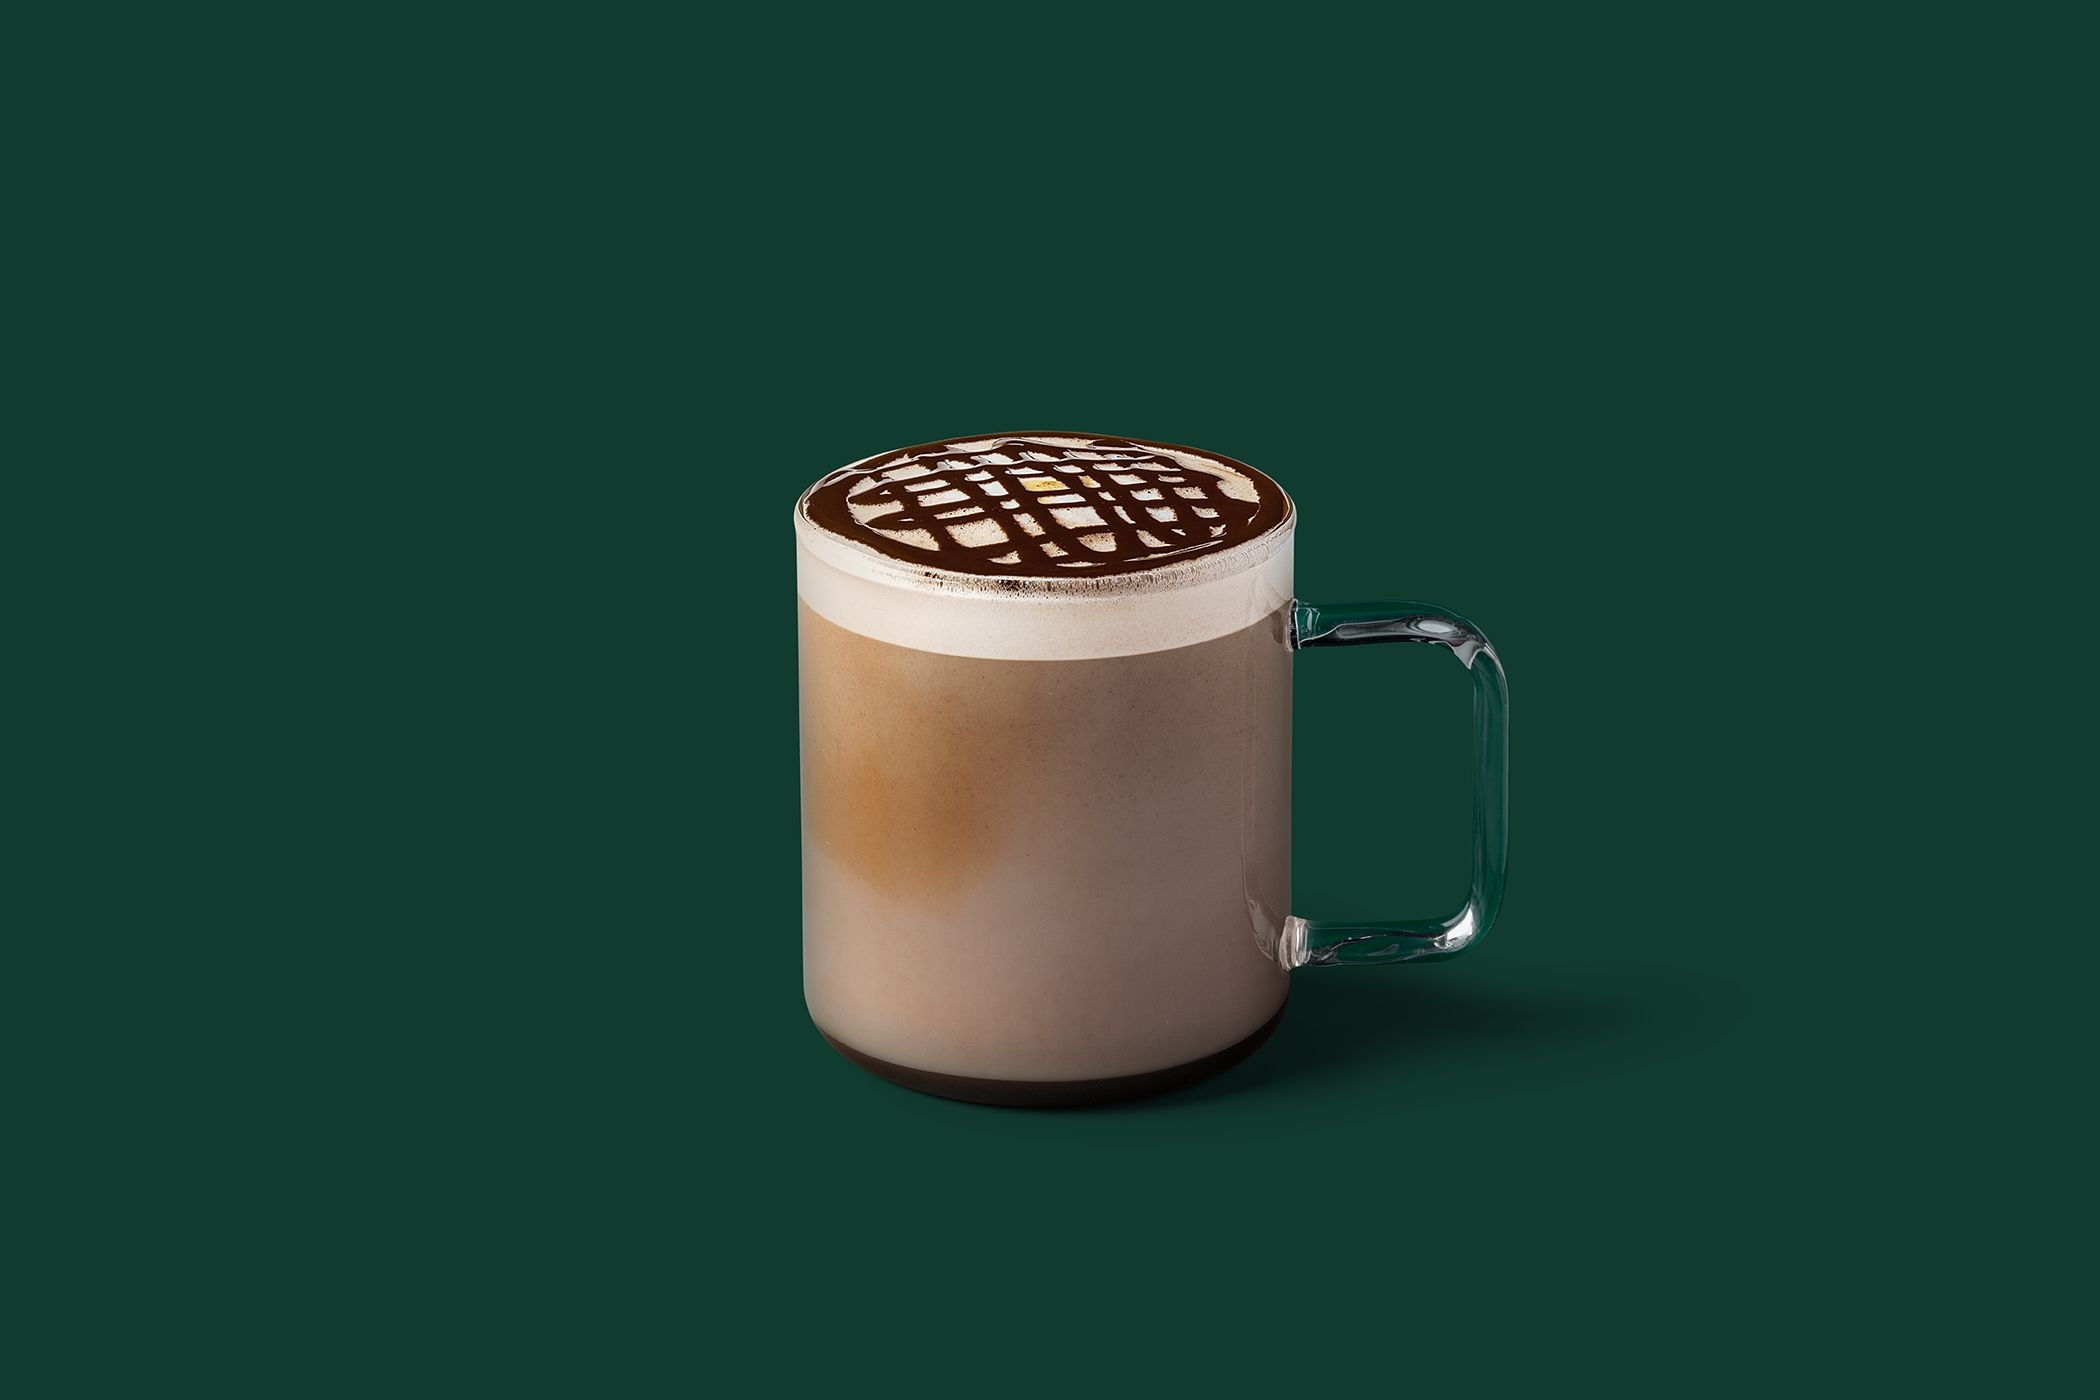 The new Starbucks autumn menu is already here